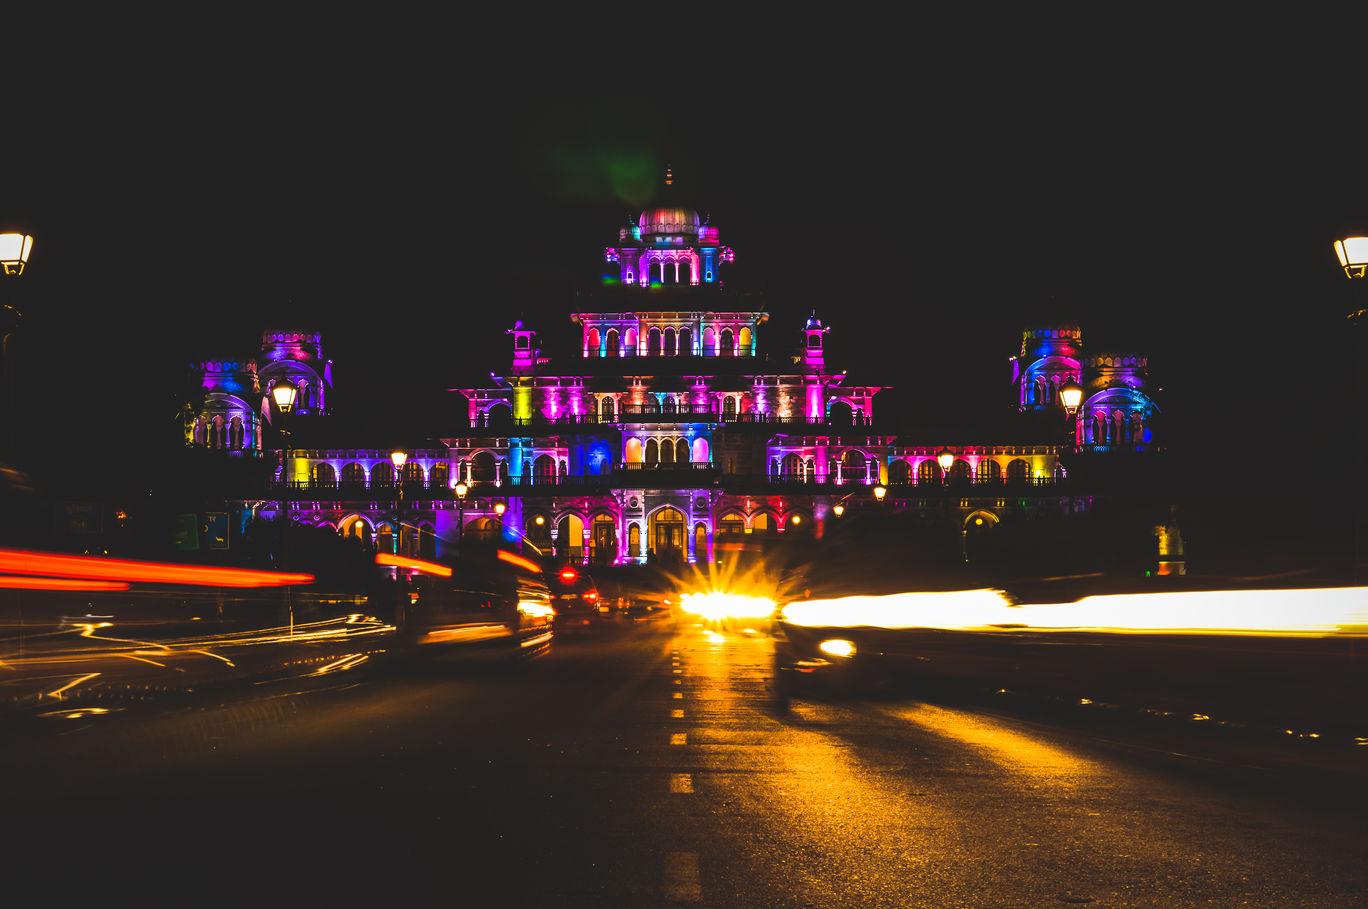 Photo of Albert Hall Museum By Sarsij Mishra